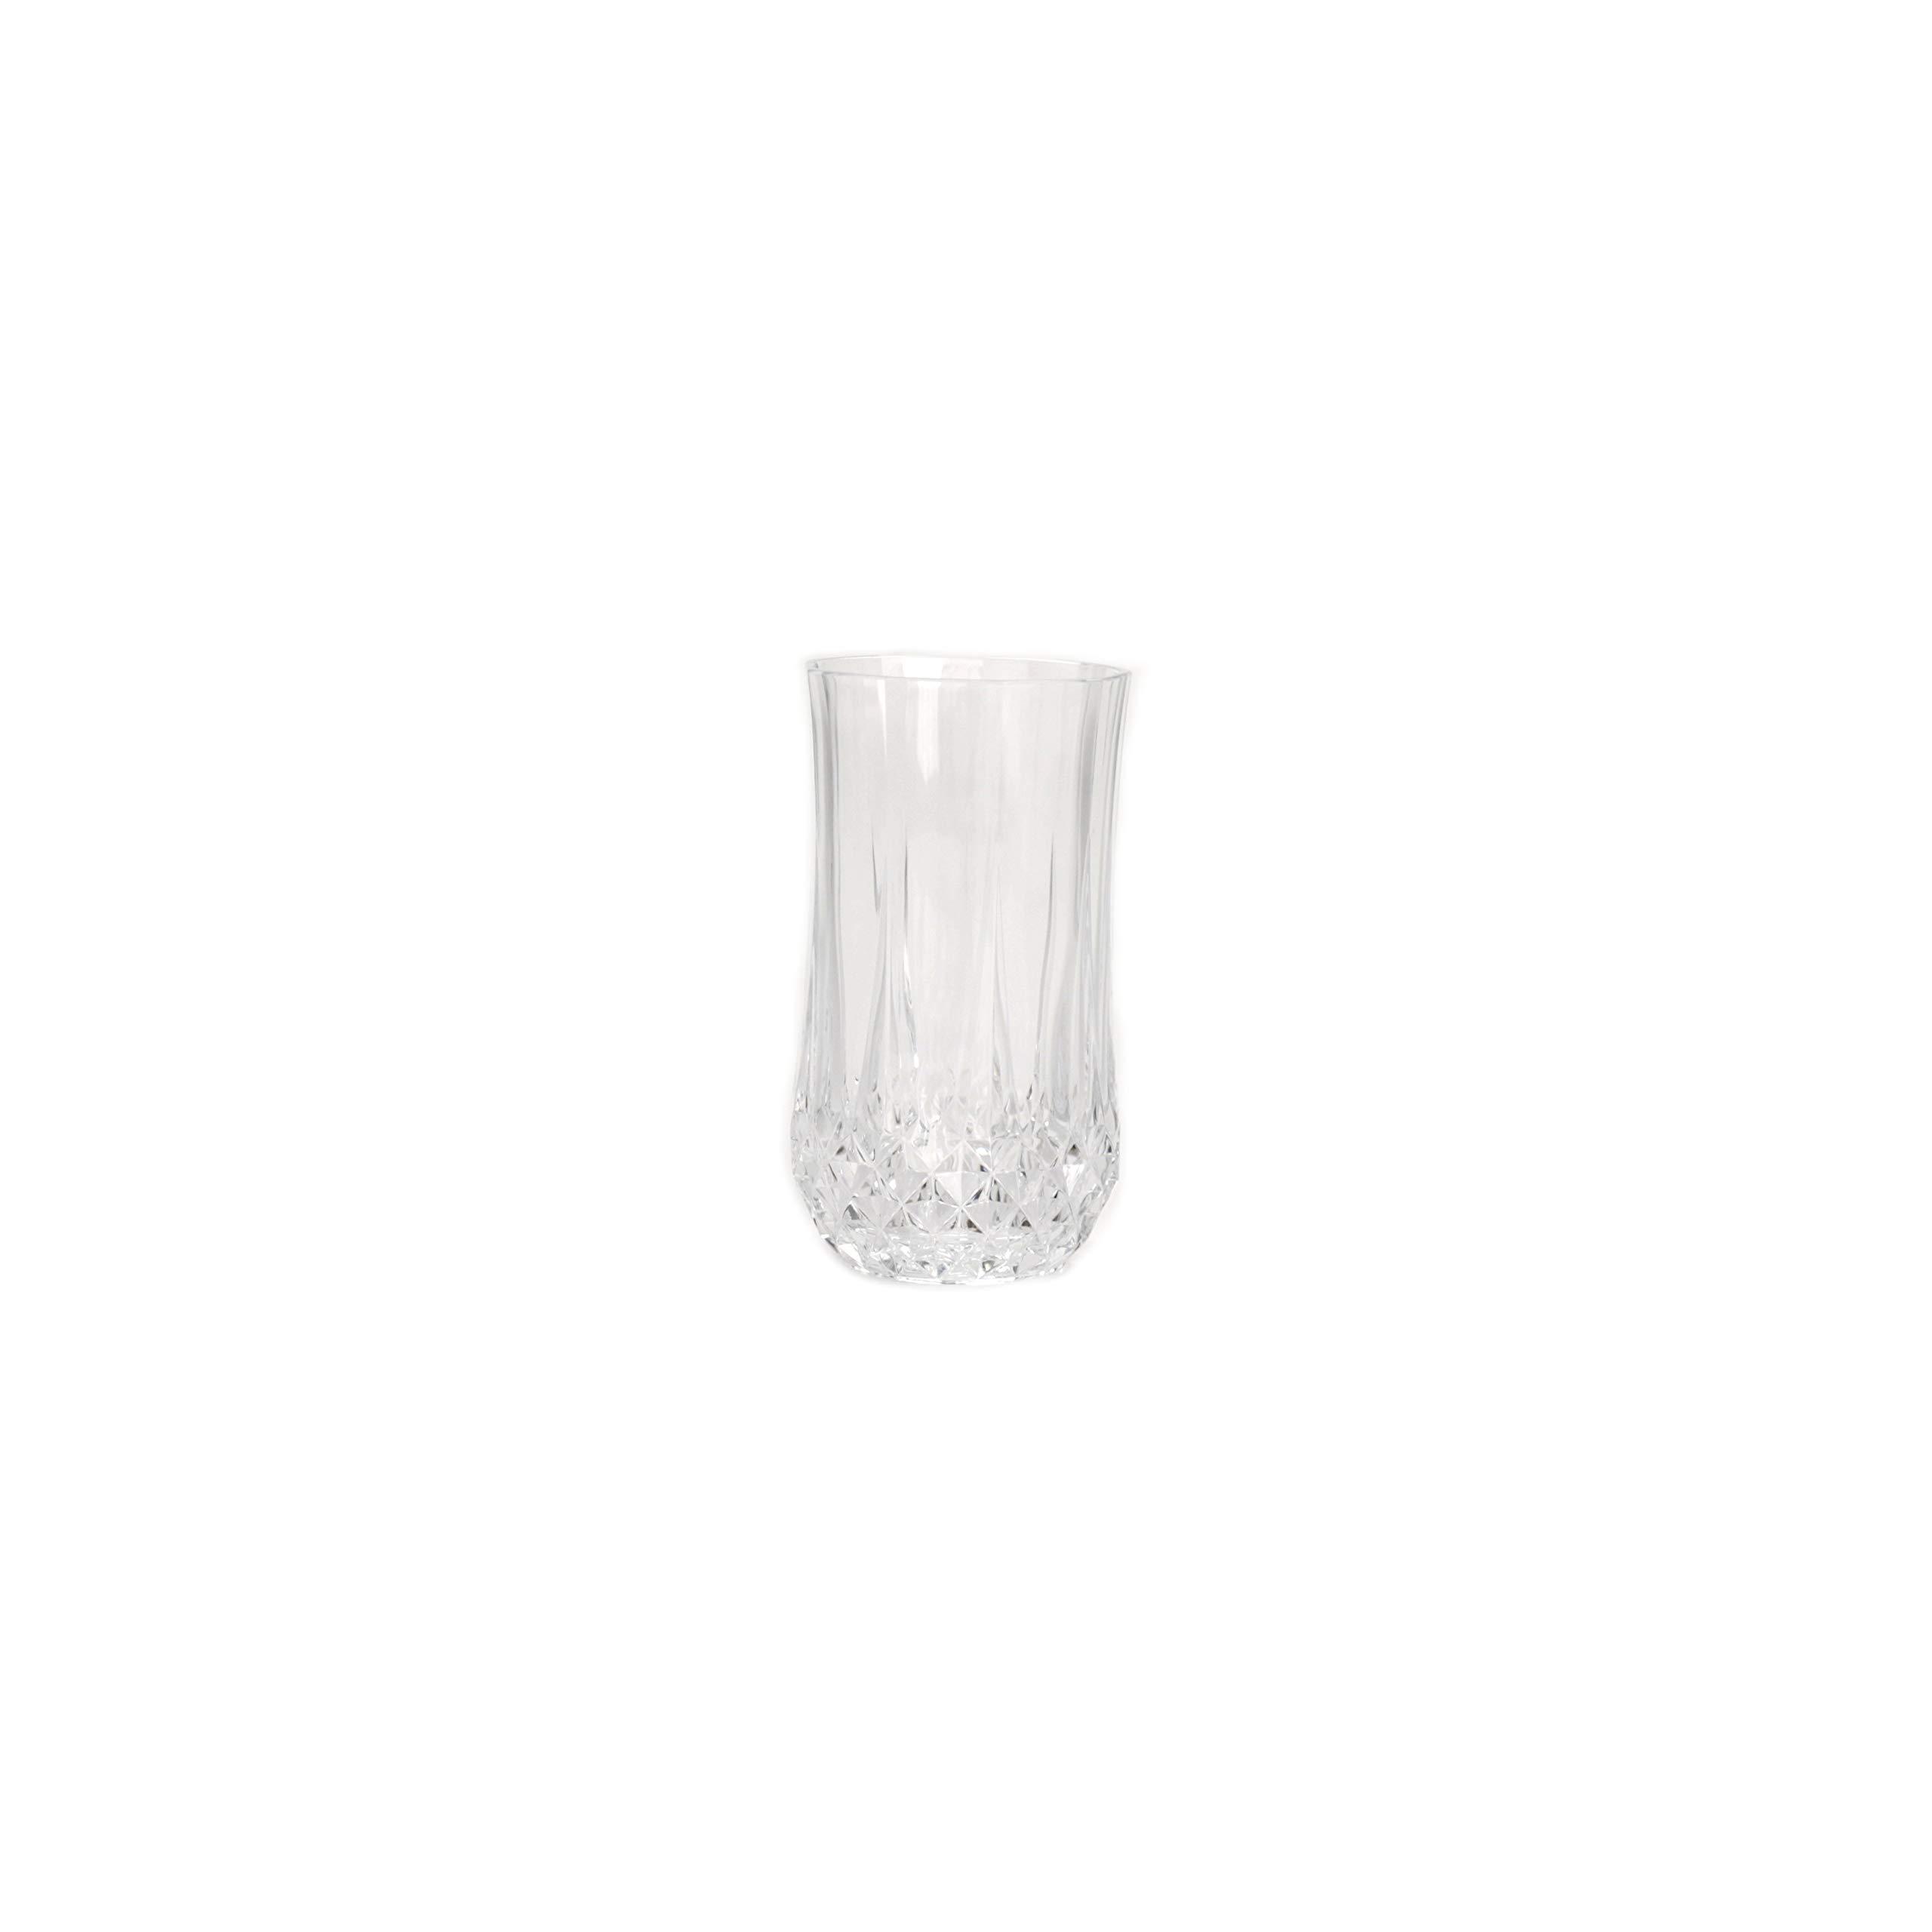 M Block & Sons Longchamp Krystal 12 Ounce Liquor Glass Set of 4